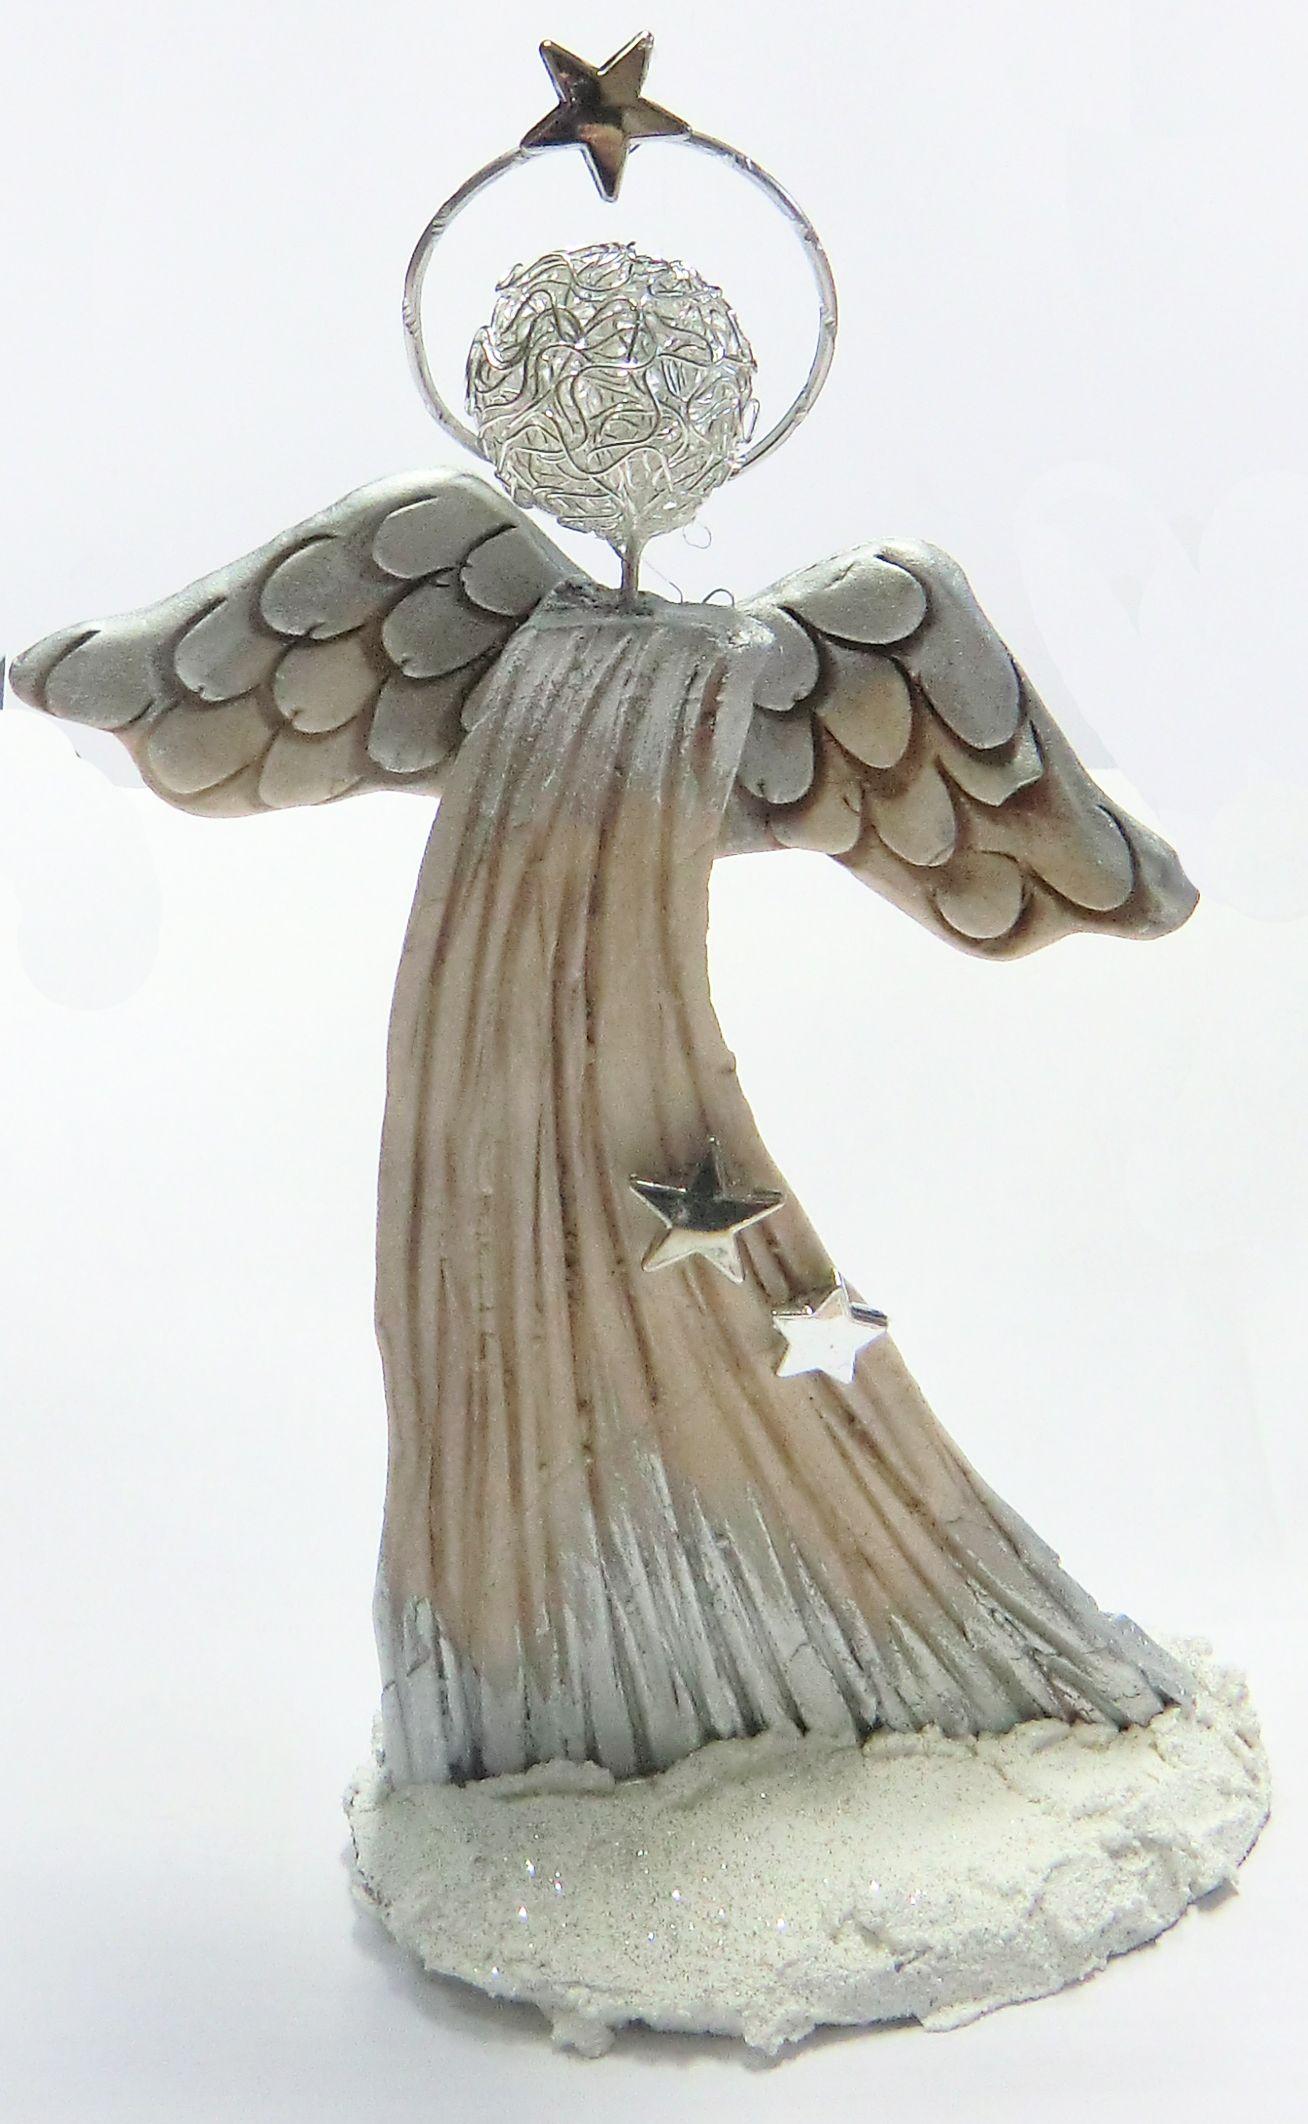 Lufttrocknender Ton engel aus lufttrocknender modelliermasse gebastelt babsi at